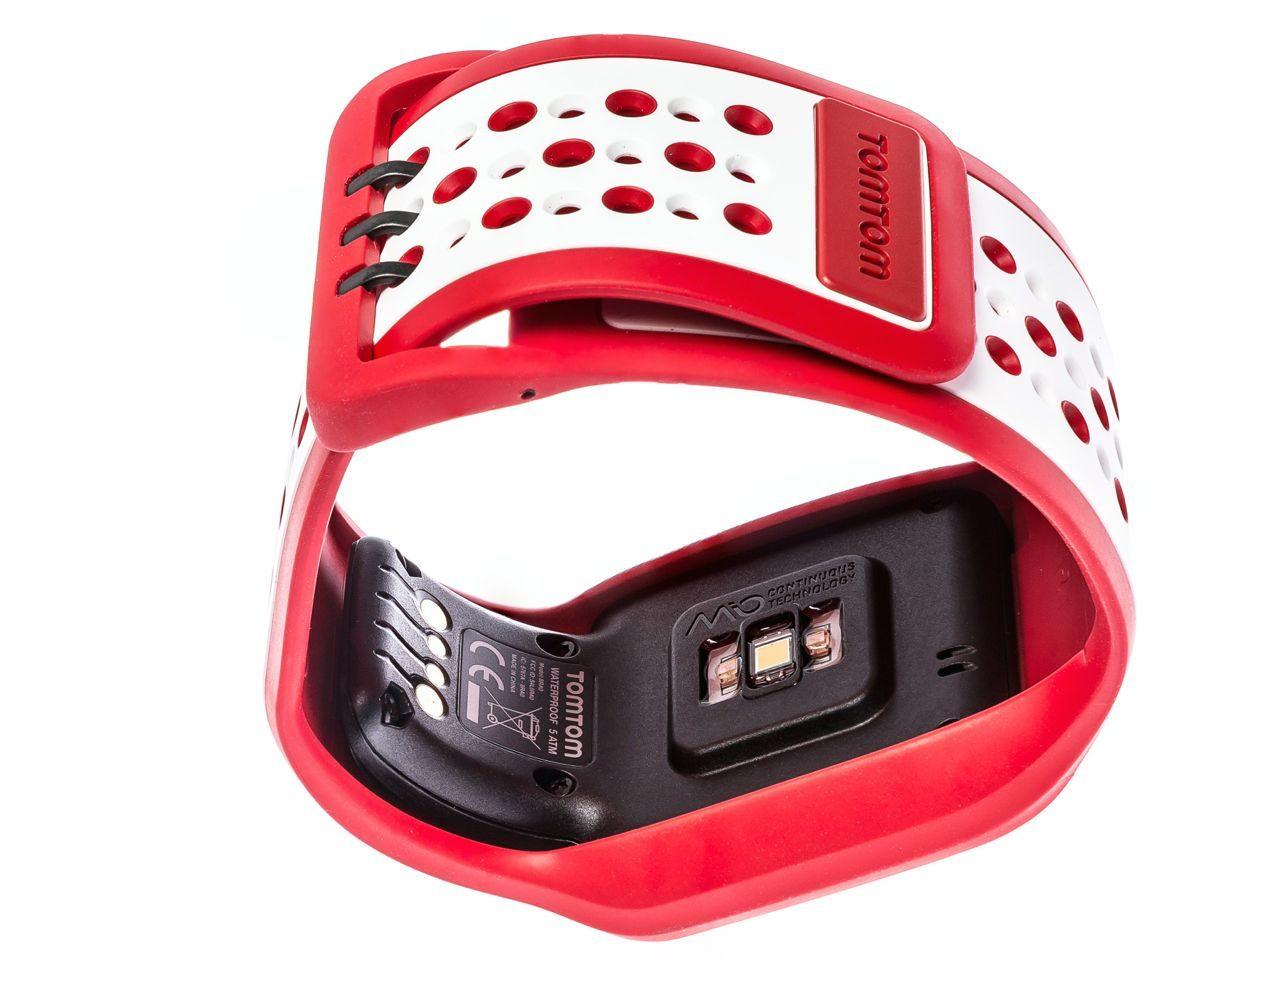 Mio optical heart-rate sensor on TomTom Runner Cardio